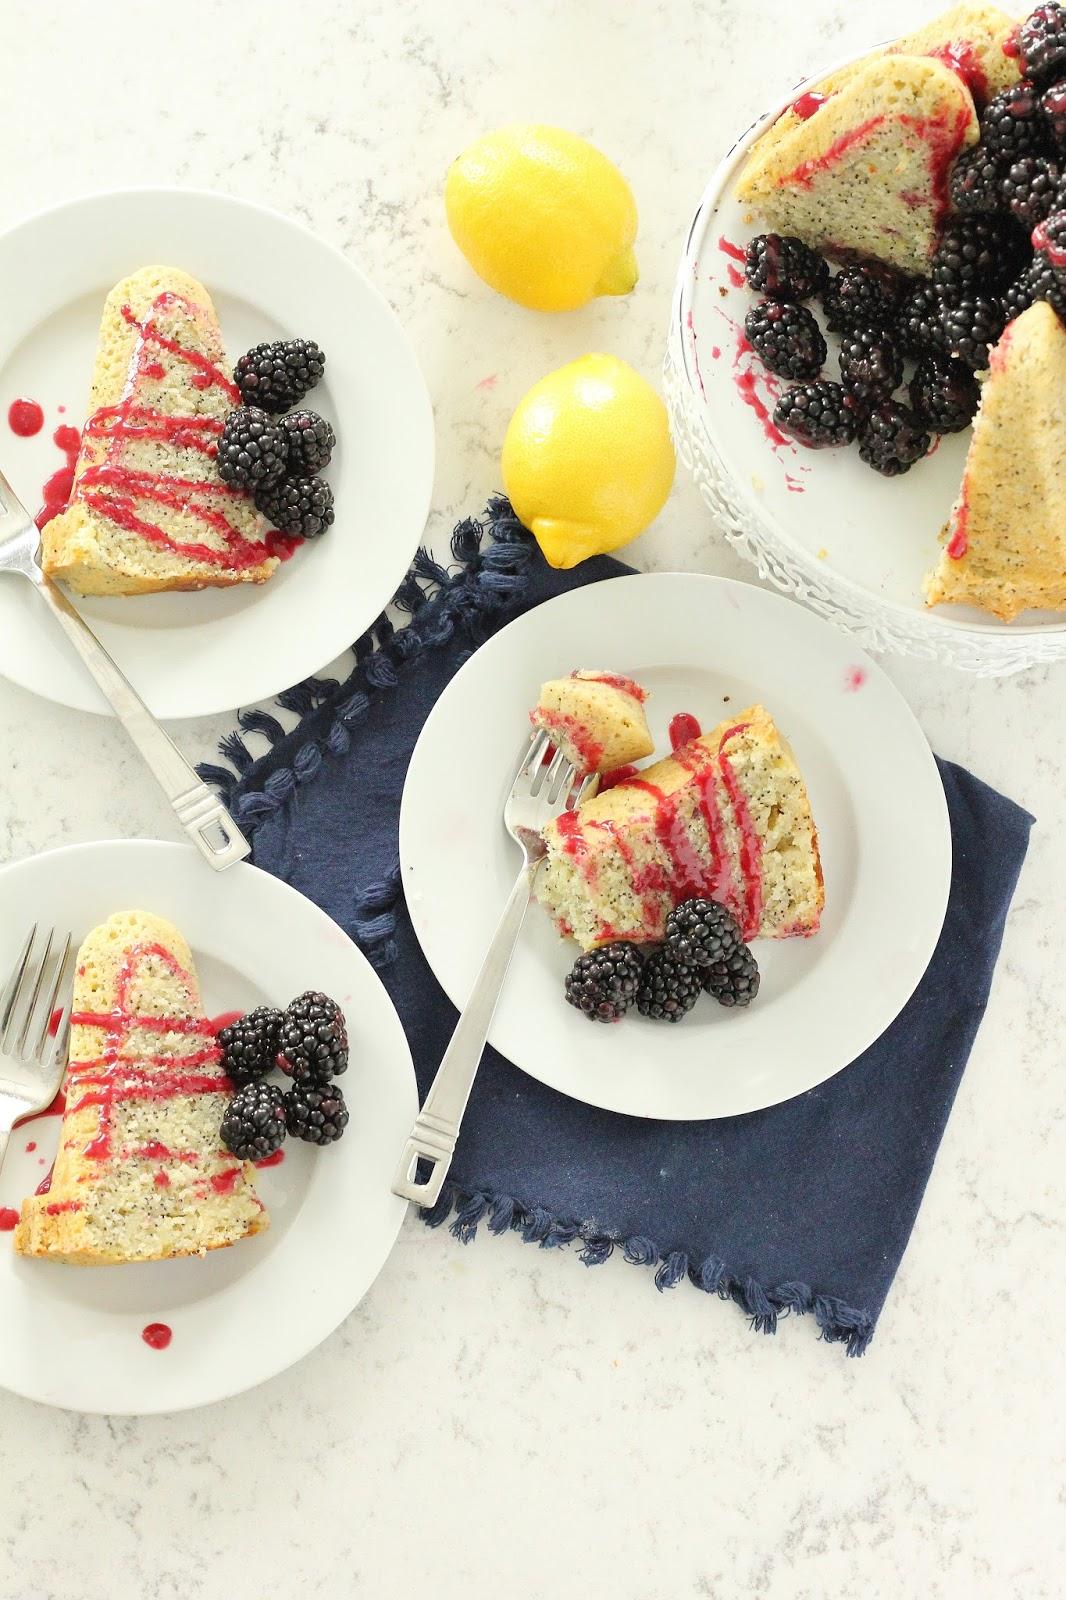 Lemon Poppyseed Bundt Cake With Blackberry Glaze